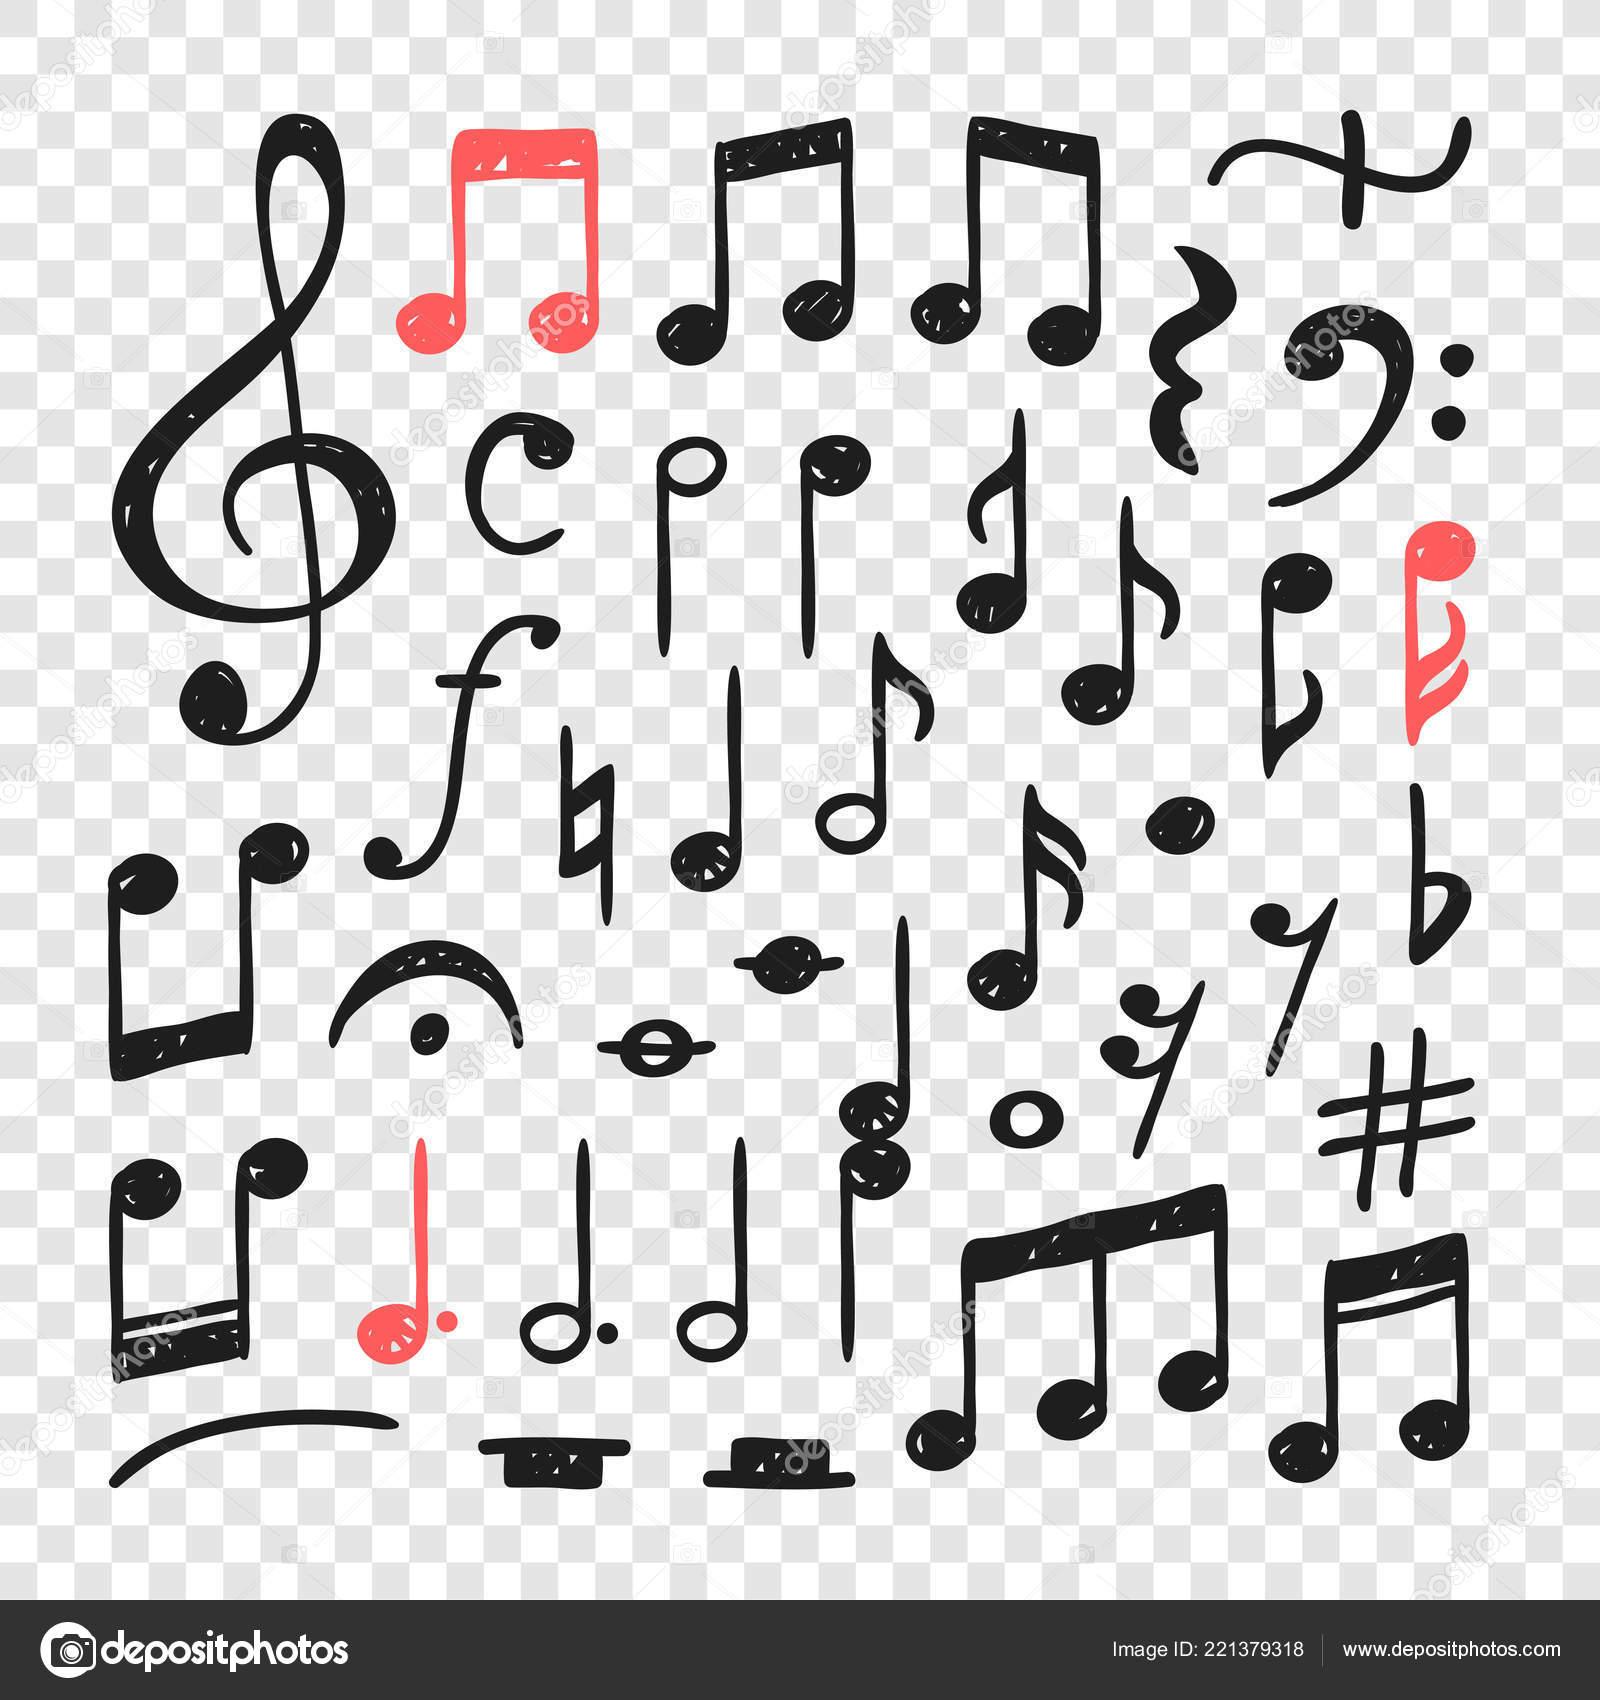 Hand Drawn Music Notes Illustration Doodle Set Symbols Creative Ink